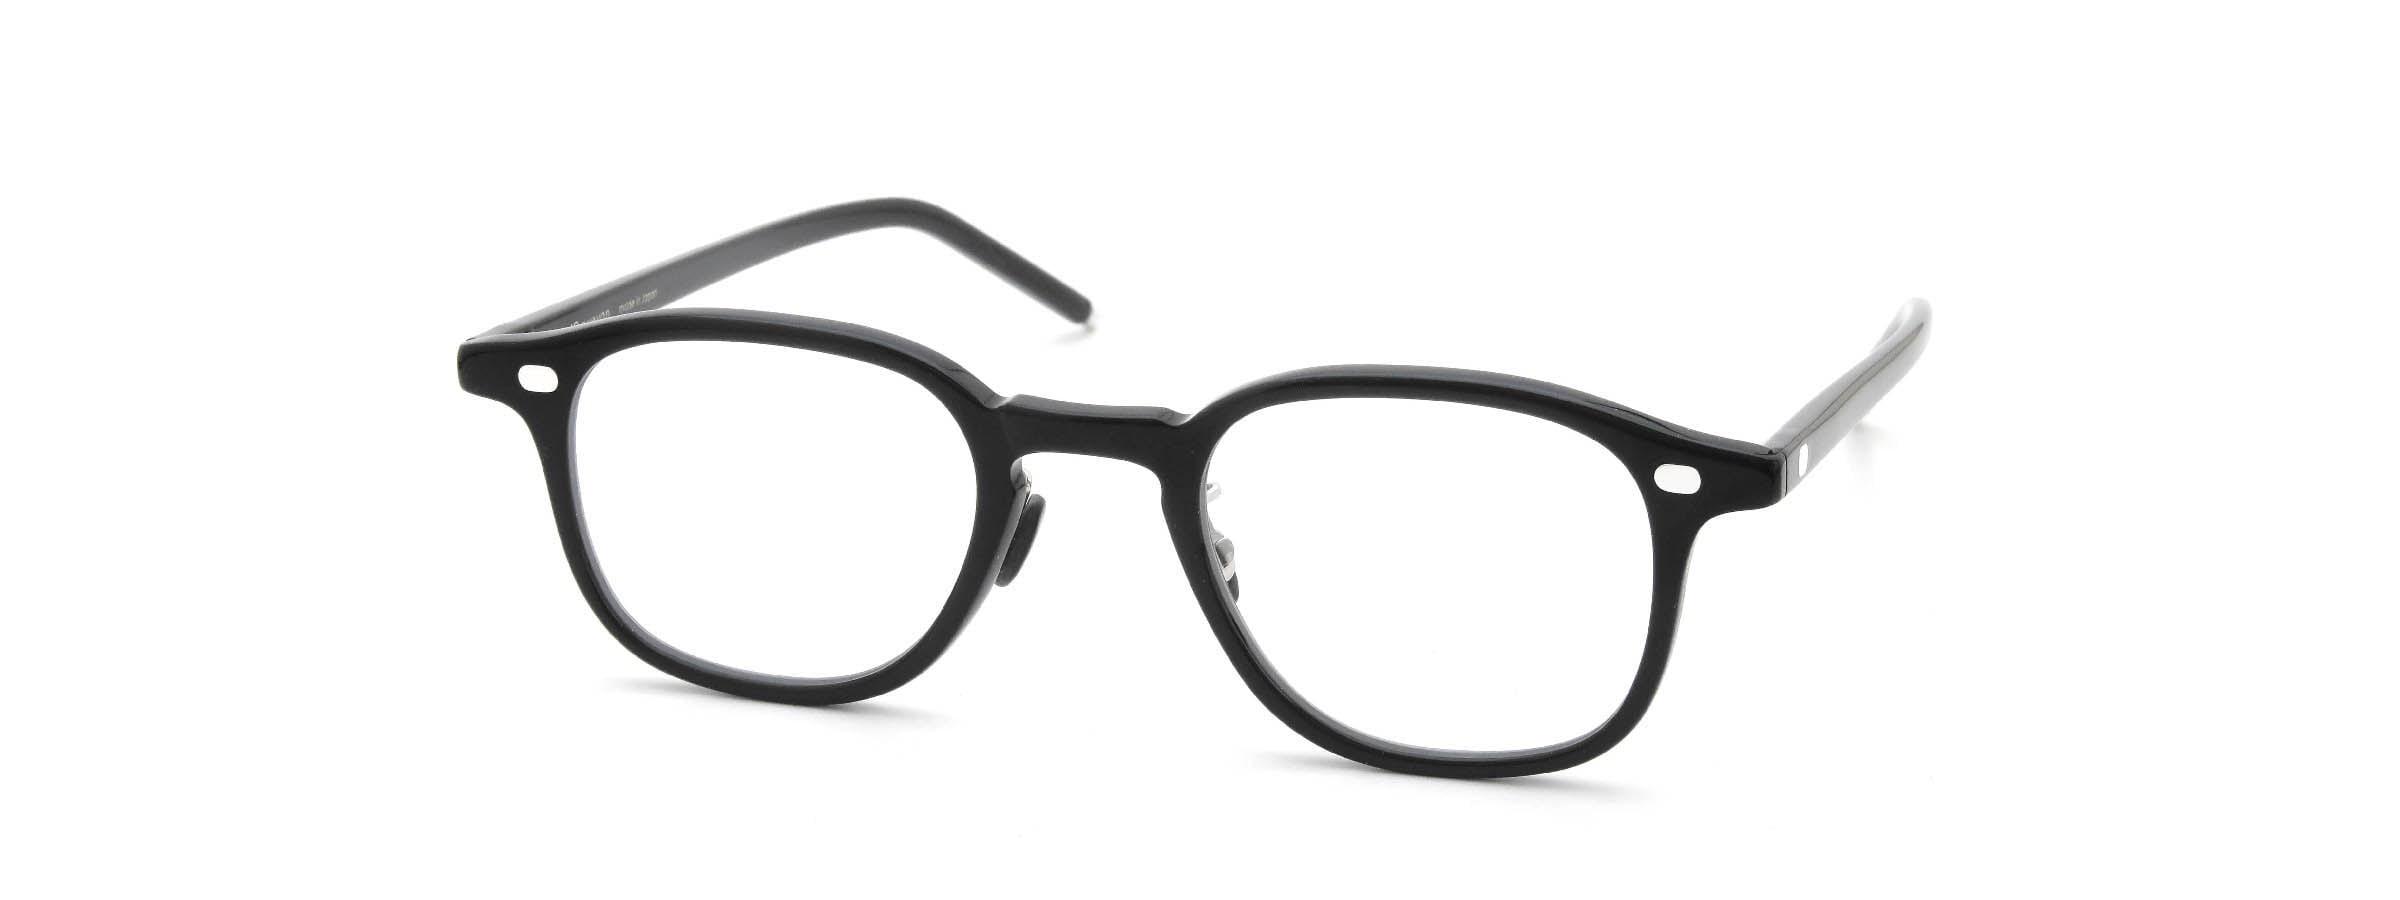 10 eyevan NO.7 Ⅲ 45size  c.1002S Black全体像